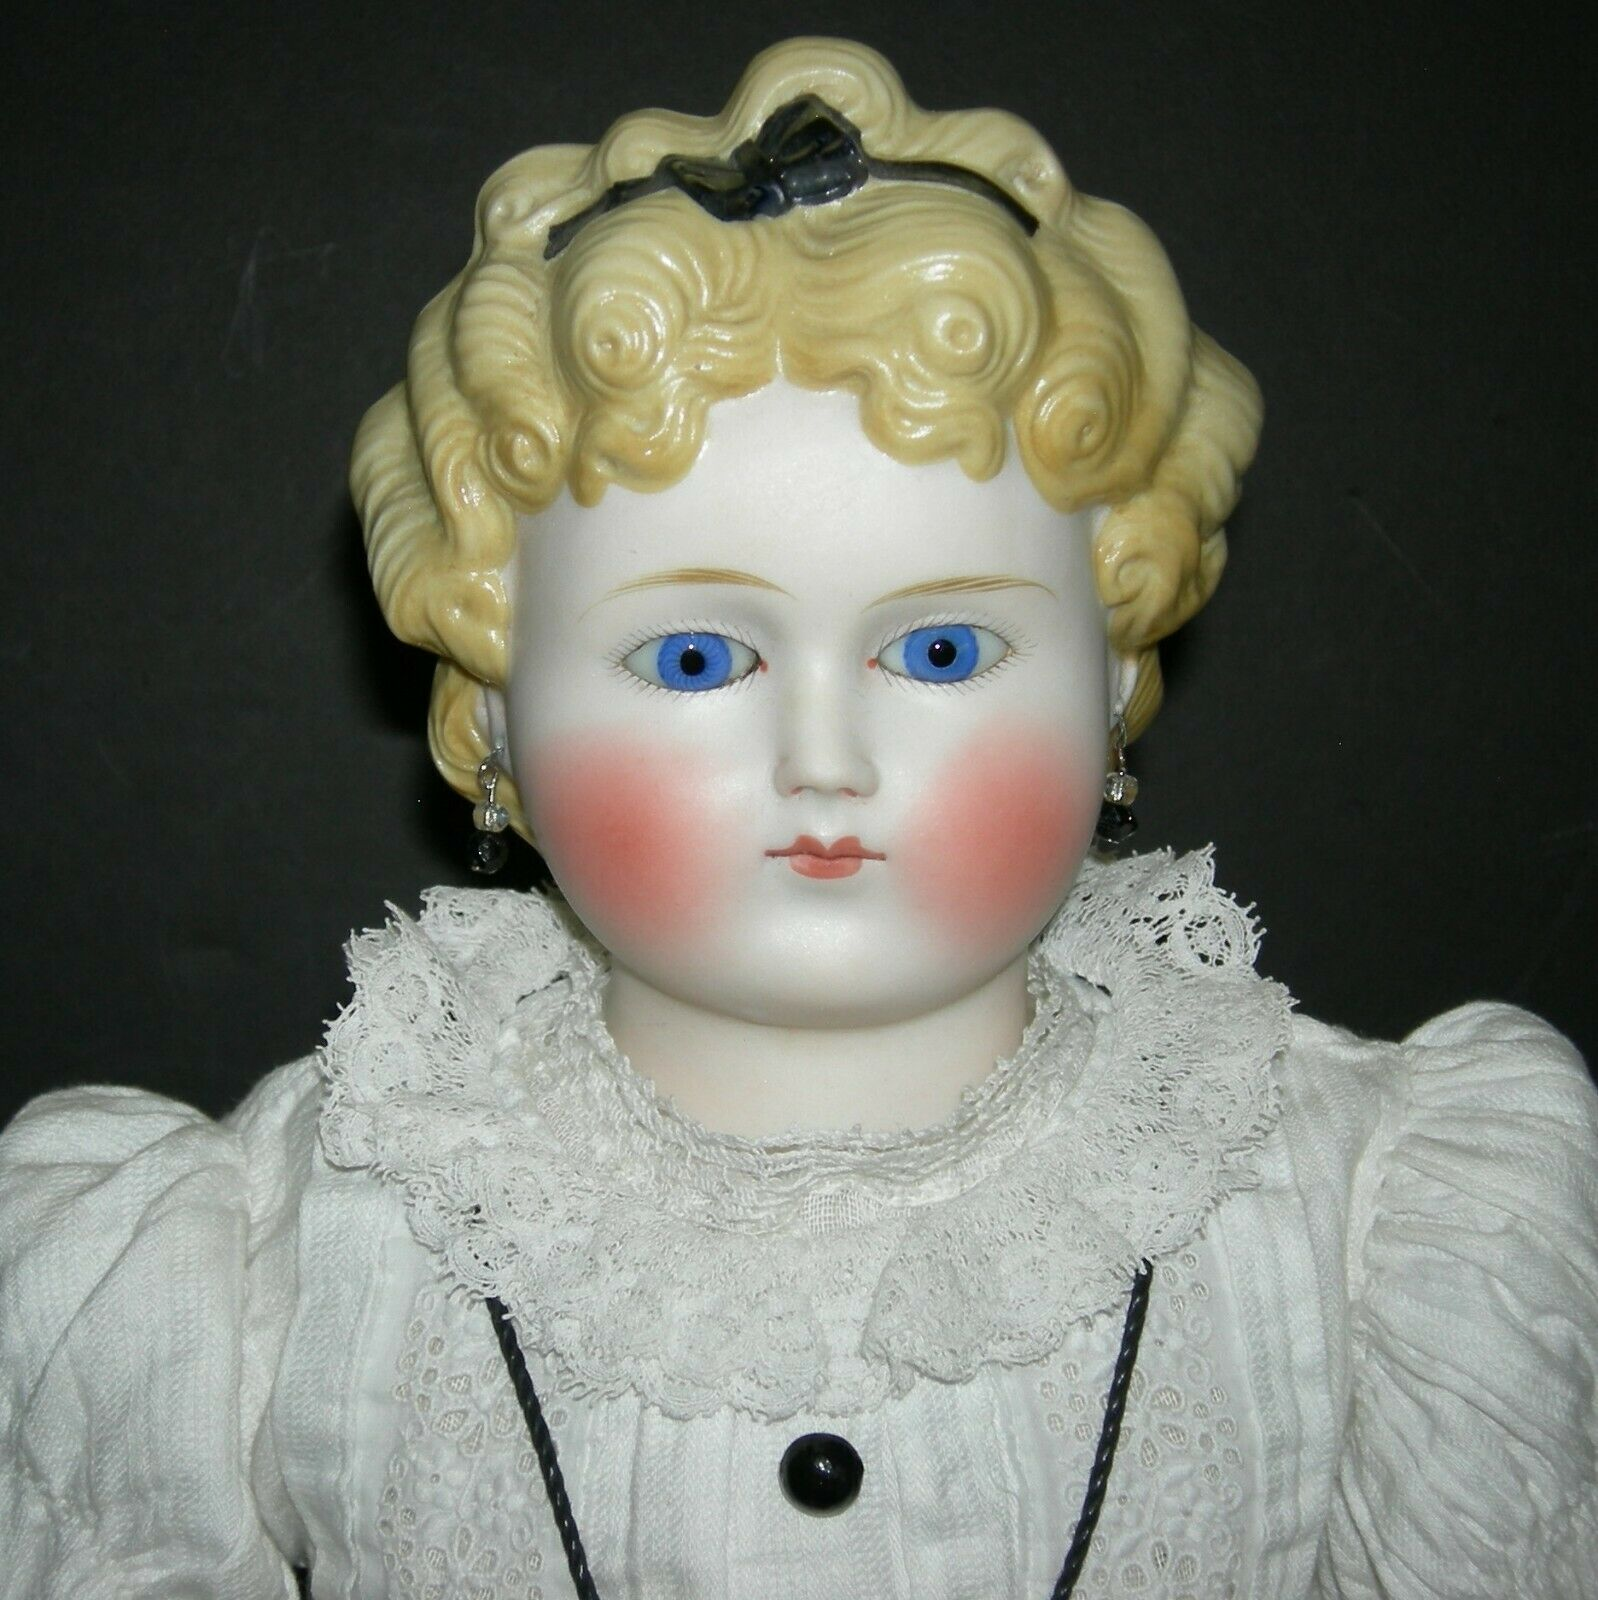 Cara rojoonda Parián moldeado pelo negro con ojos de vidrio-orejas perforadas-viejo cuerpo